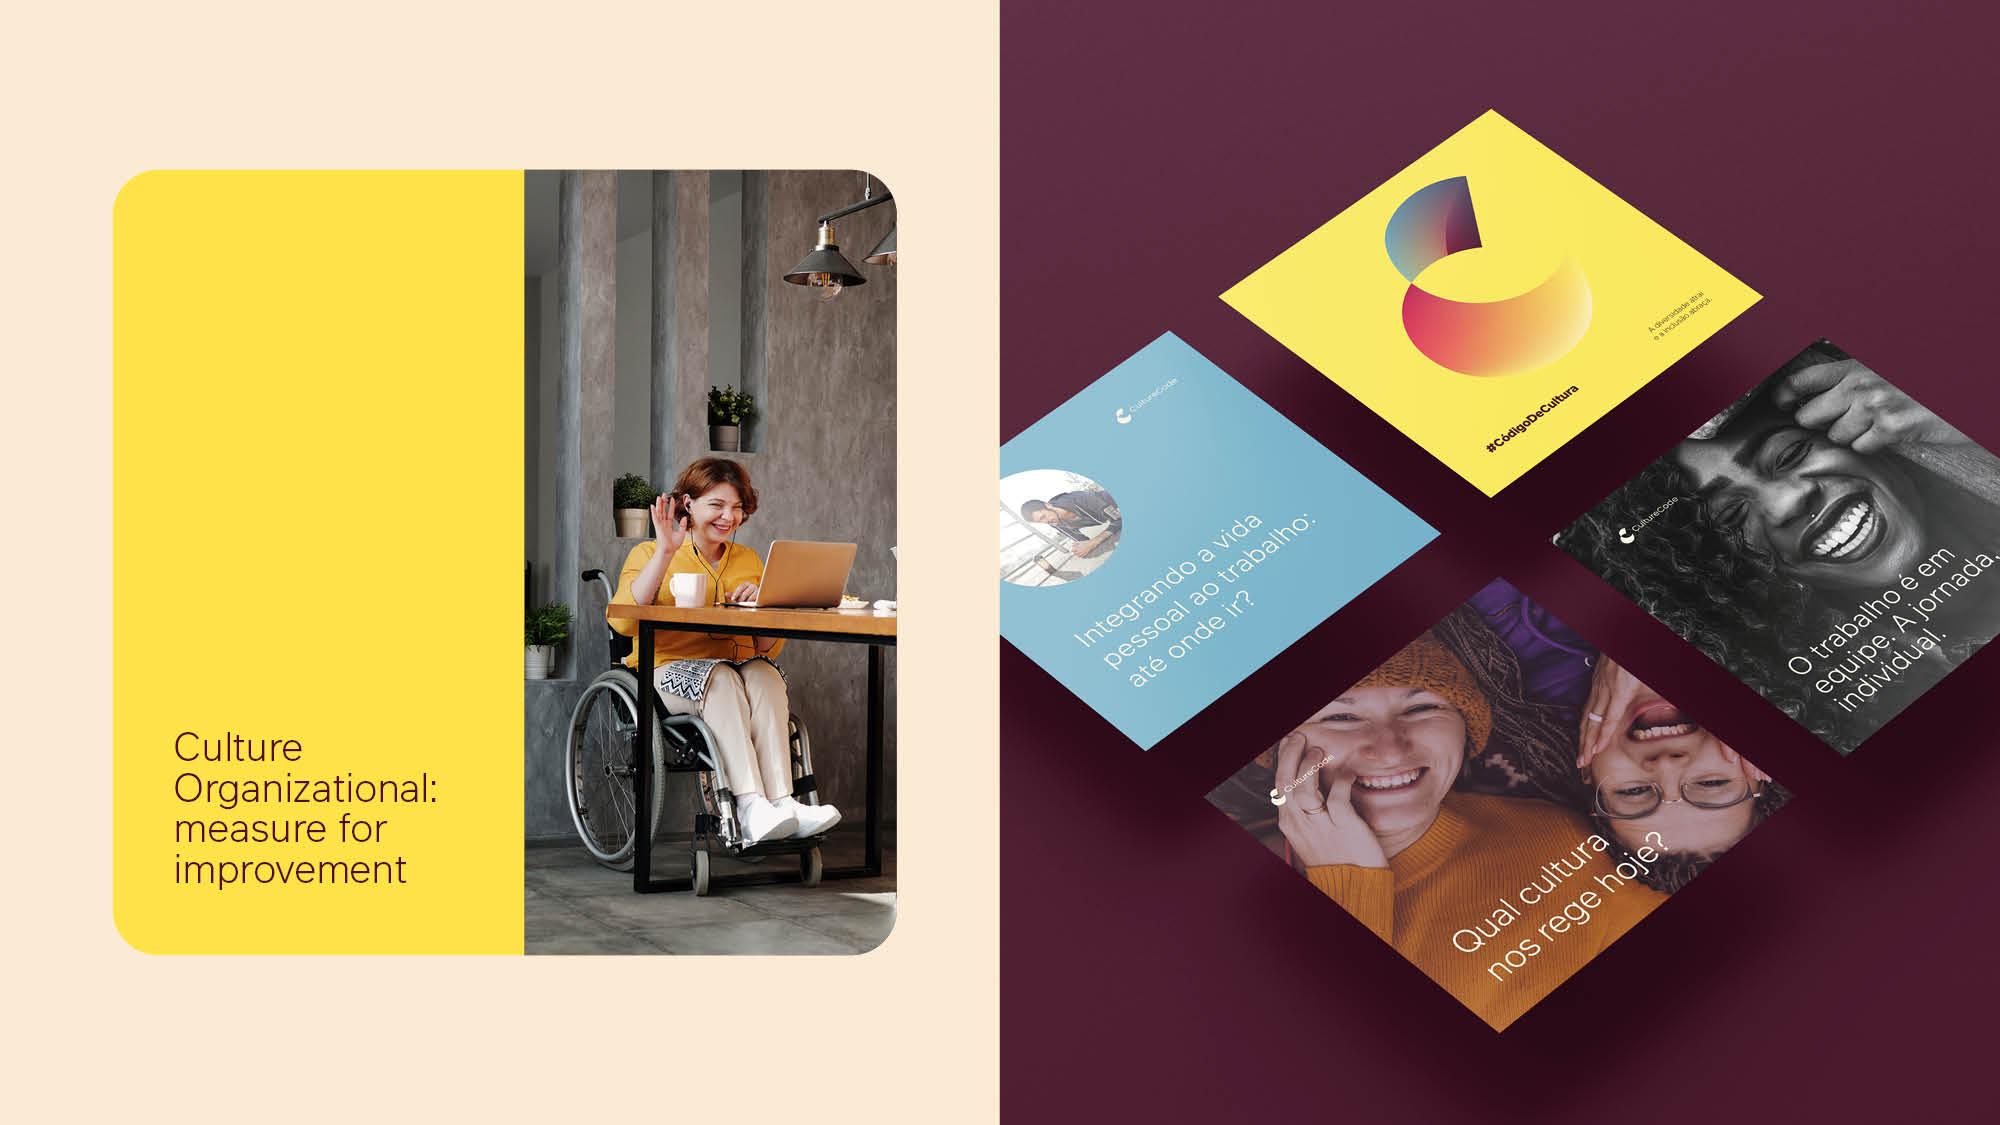 Lanatta-Branding-and-Design-Culture-Code10